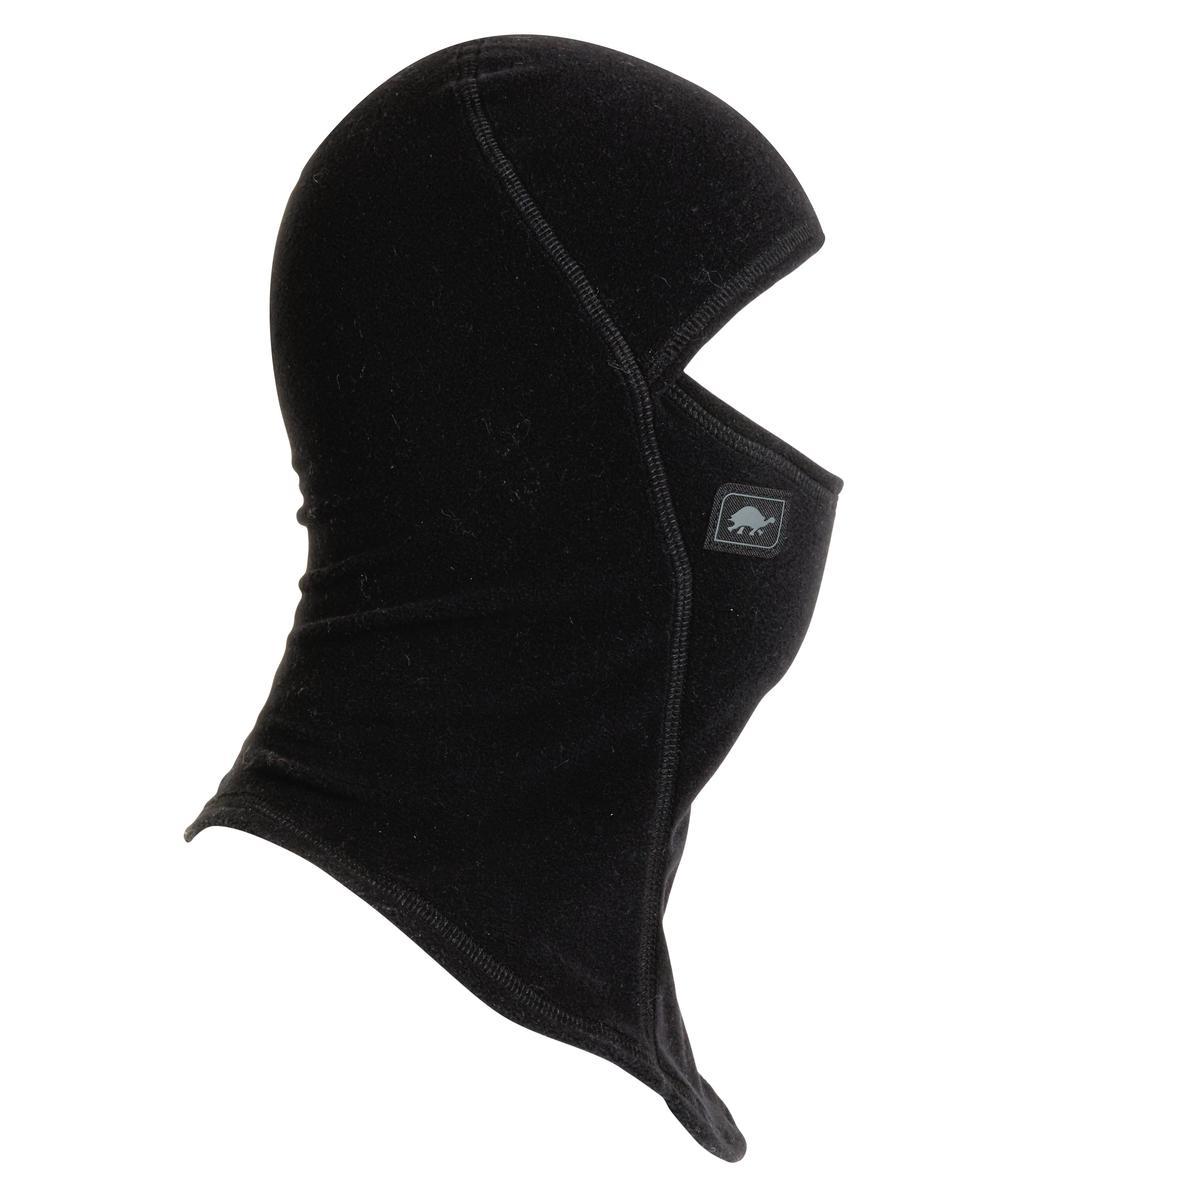 Turtle Fur Fleece Ninja Balaclava Face Mask Black